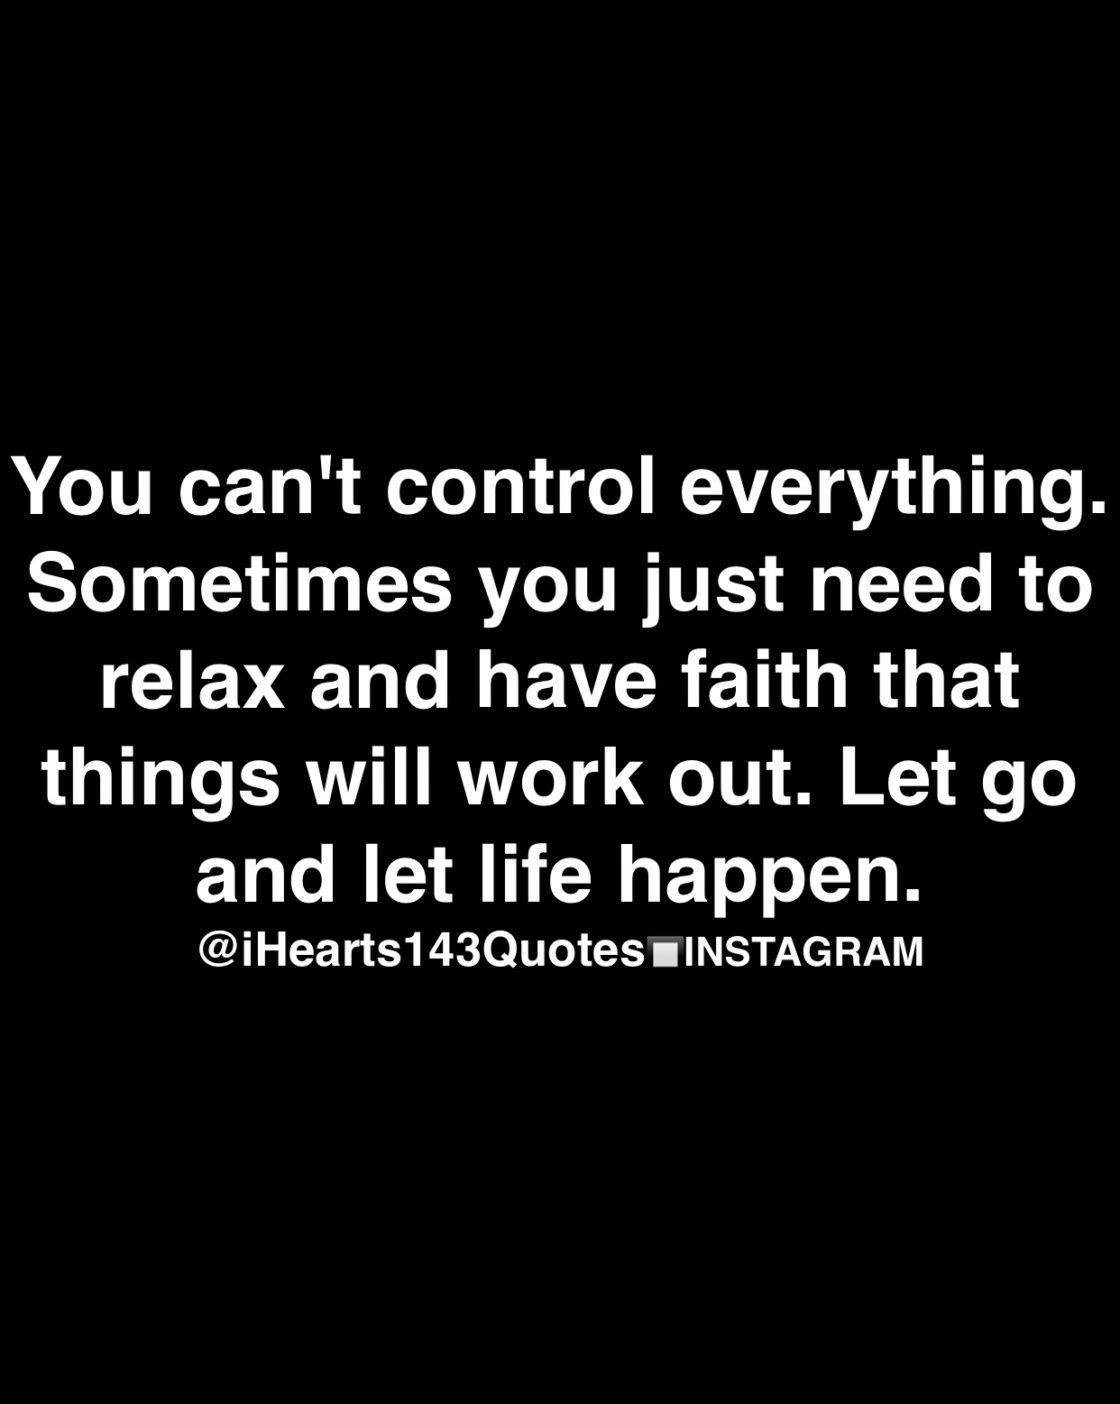 Quotes Instagram Instagram Quotes  Ihearts143Quotes